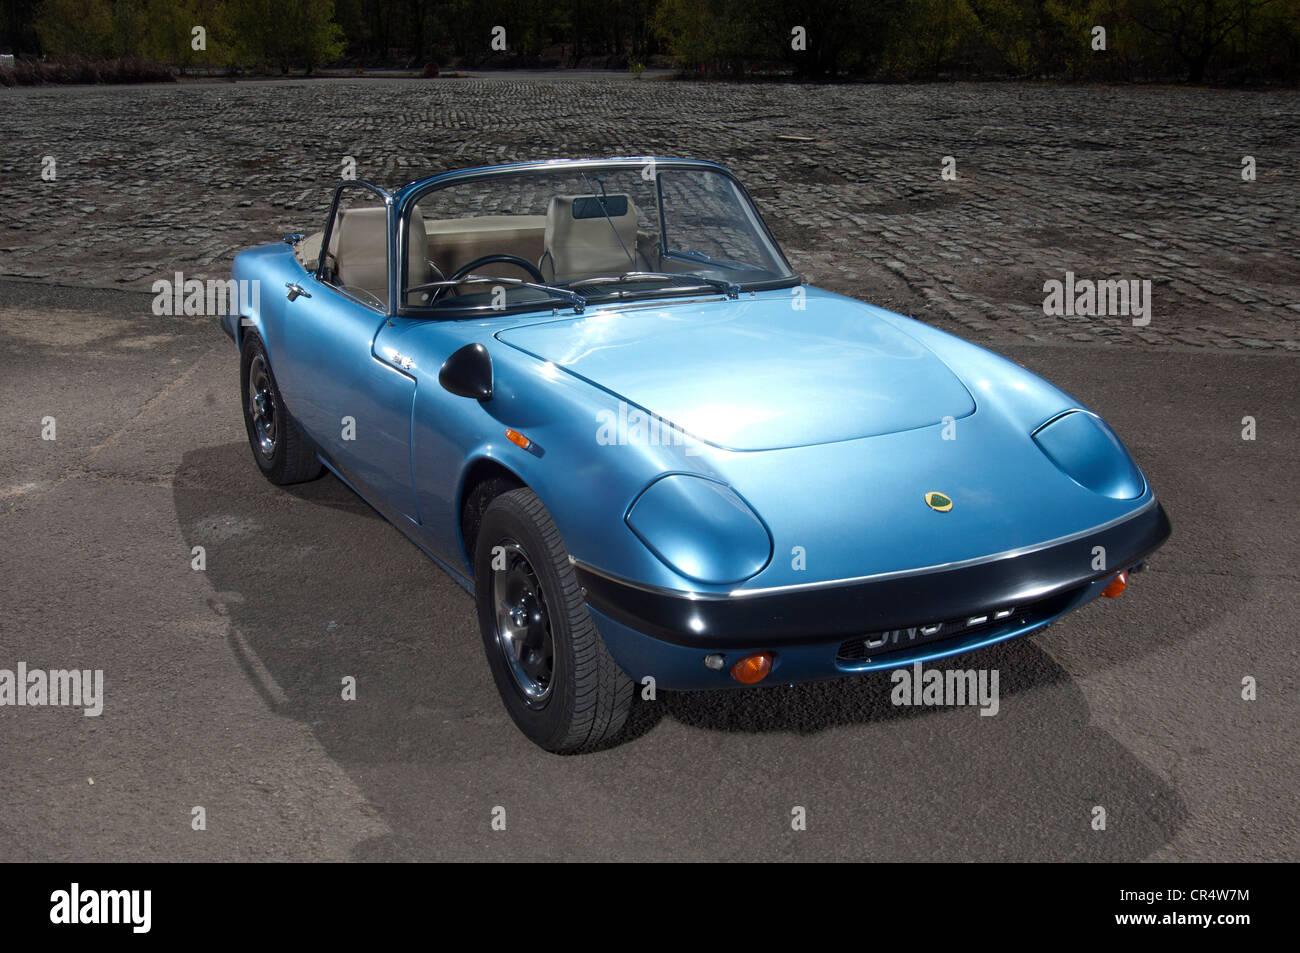 Lotus Elan classic British soft top sports car - Stock Image